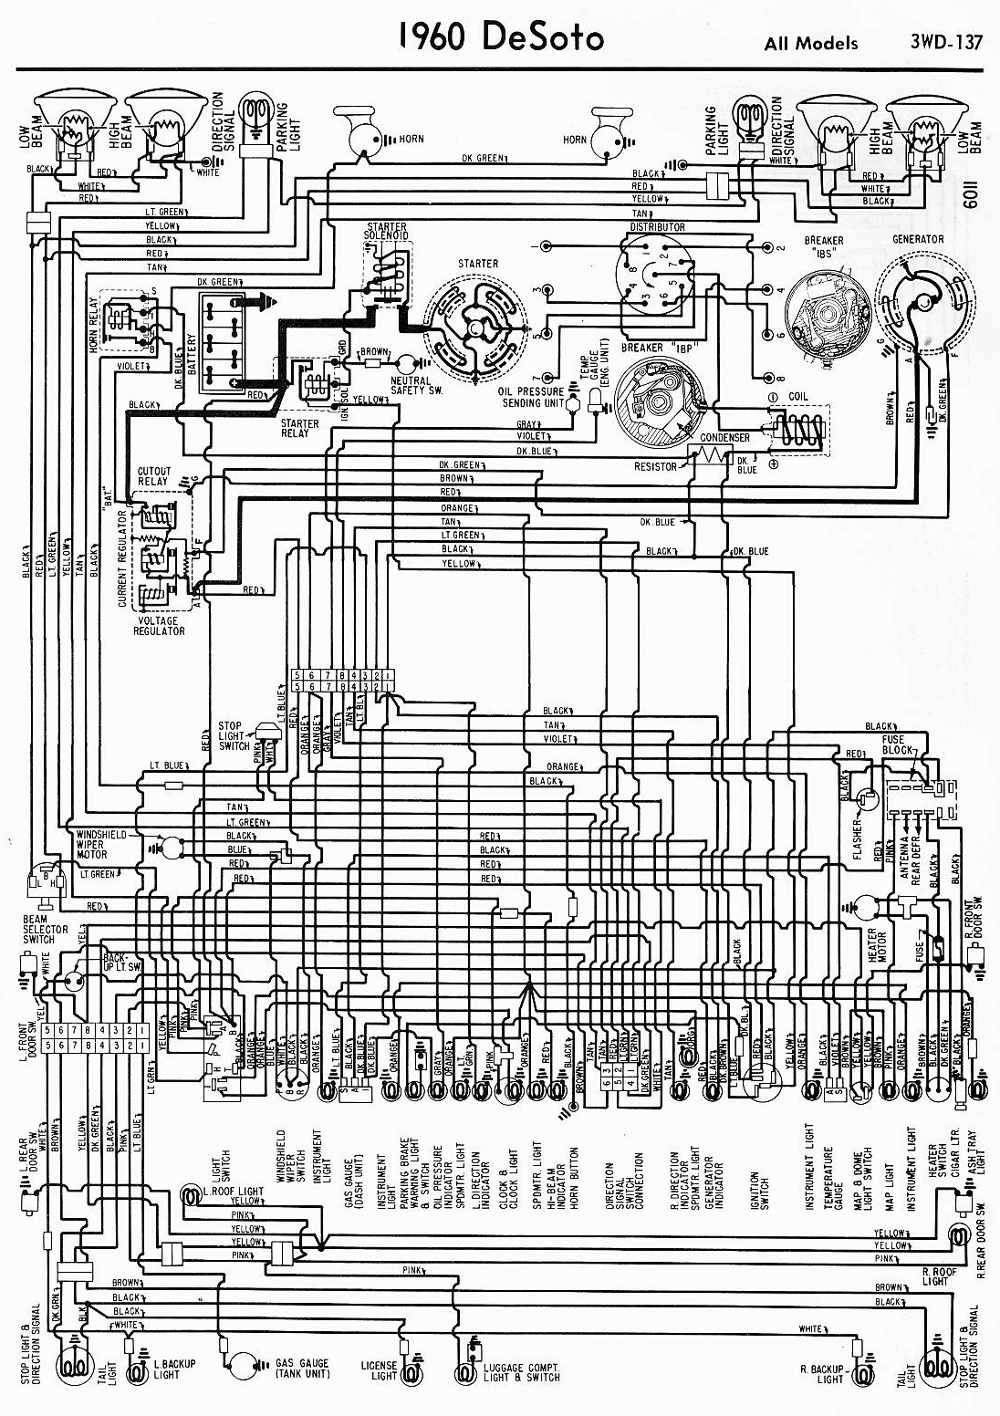 1946 Desoto Wiring Diagram Diagrams 1942 Dodge 1941 27 Images